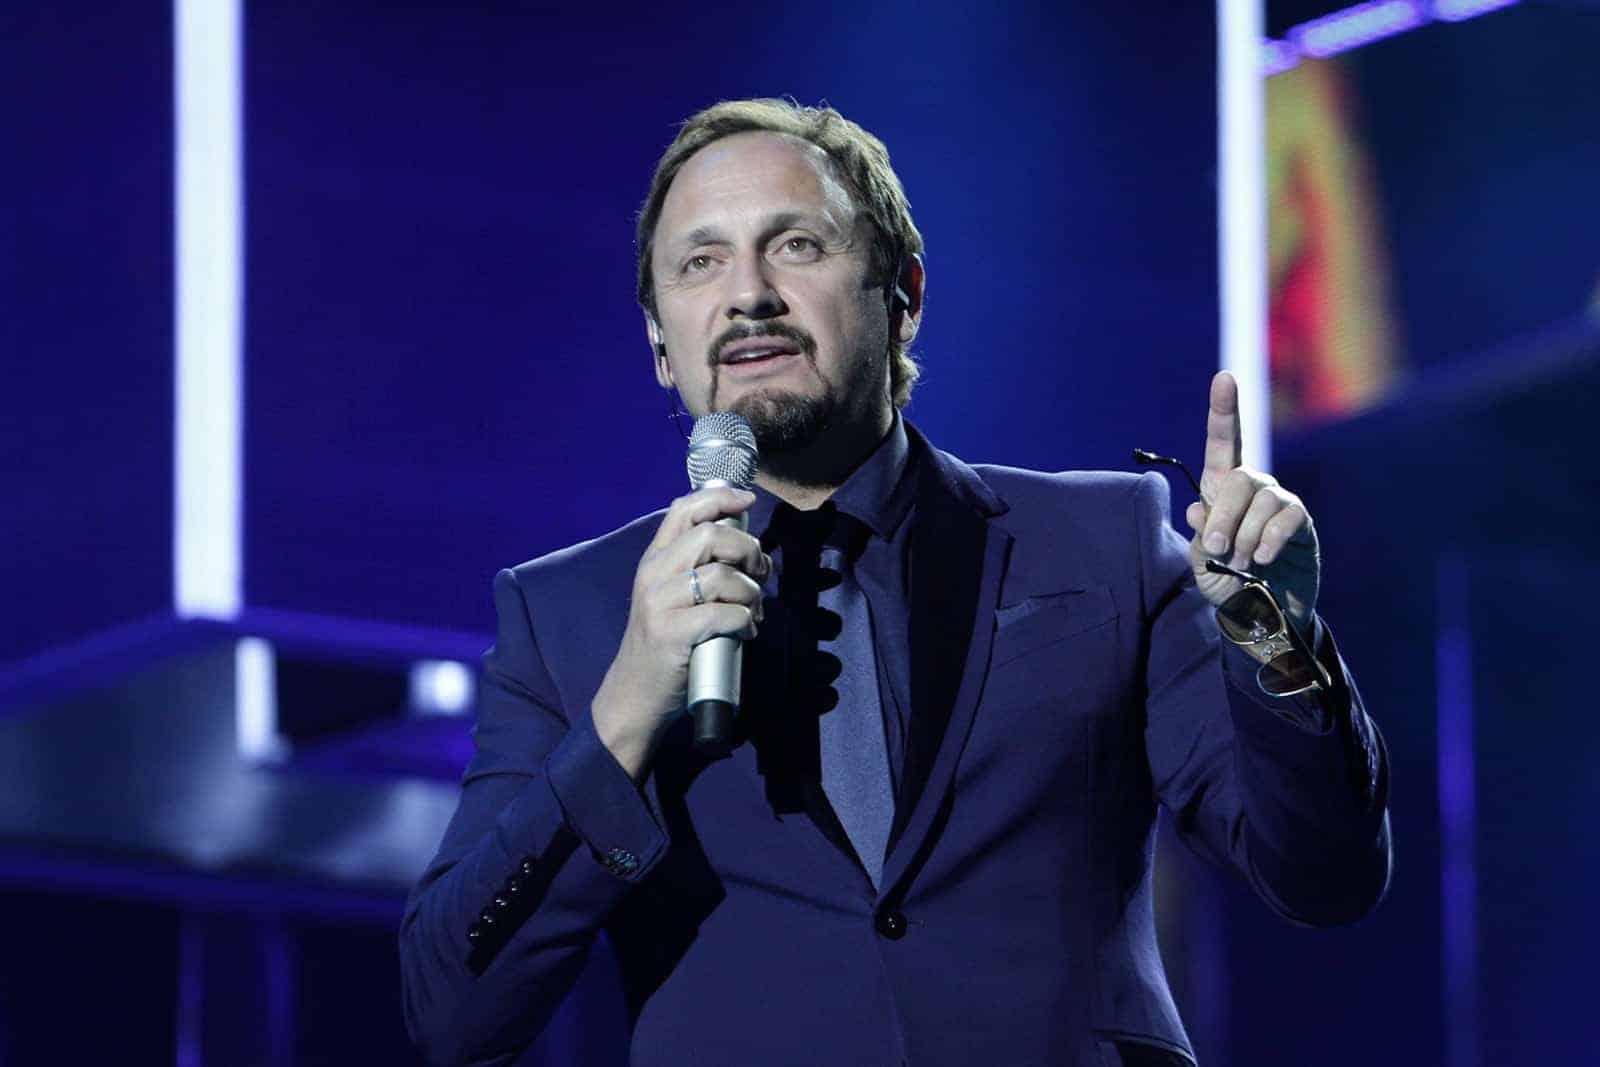 Концерт-съемка «Стас Михайлов – 50. Все для тебя» в Кремле